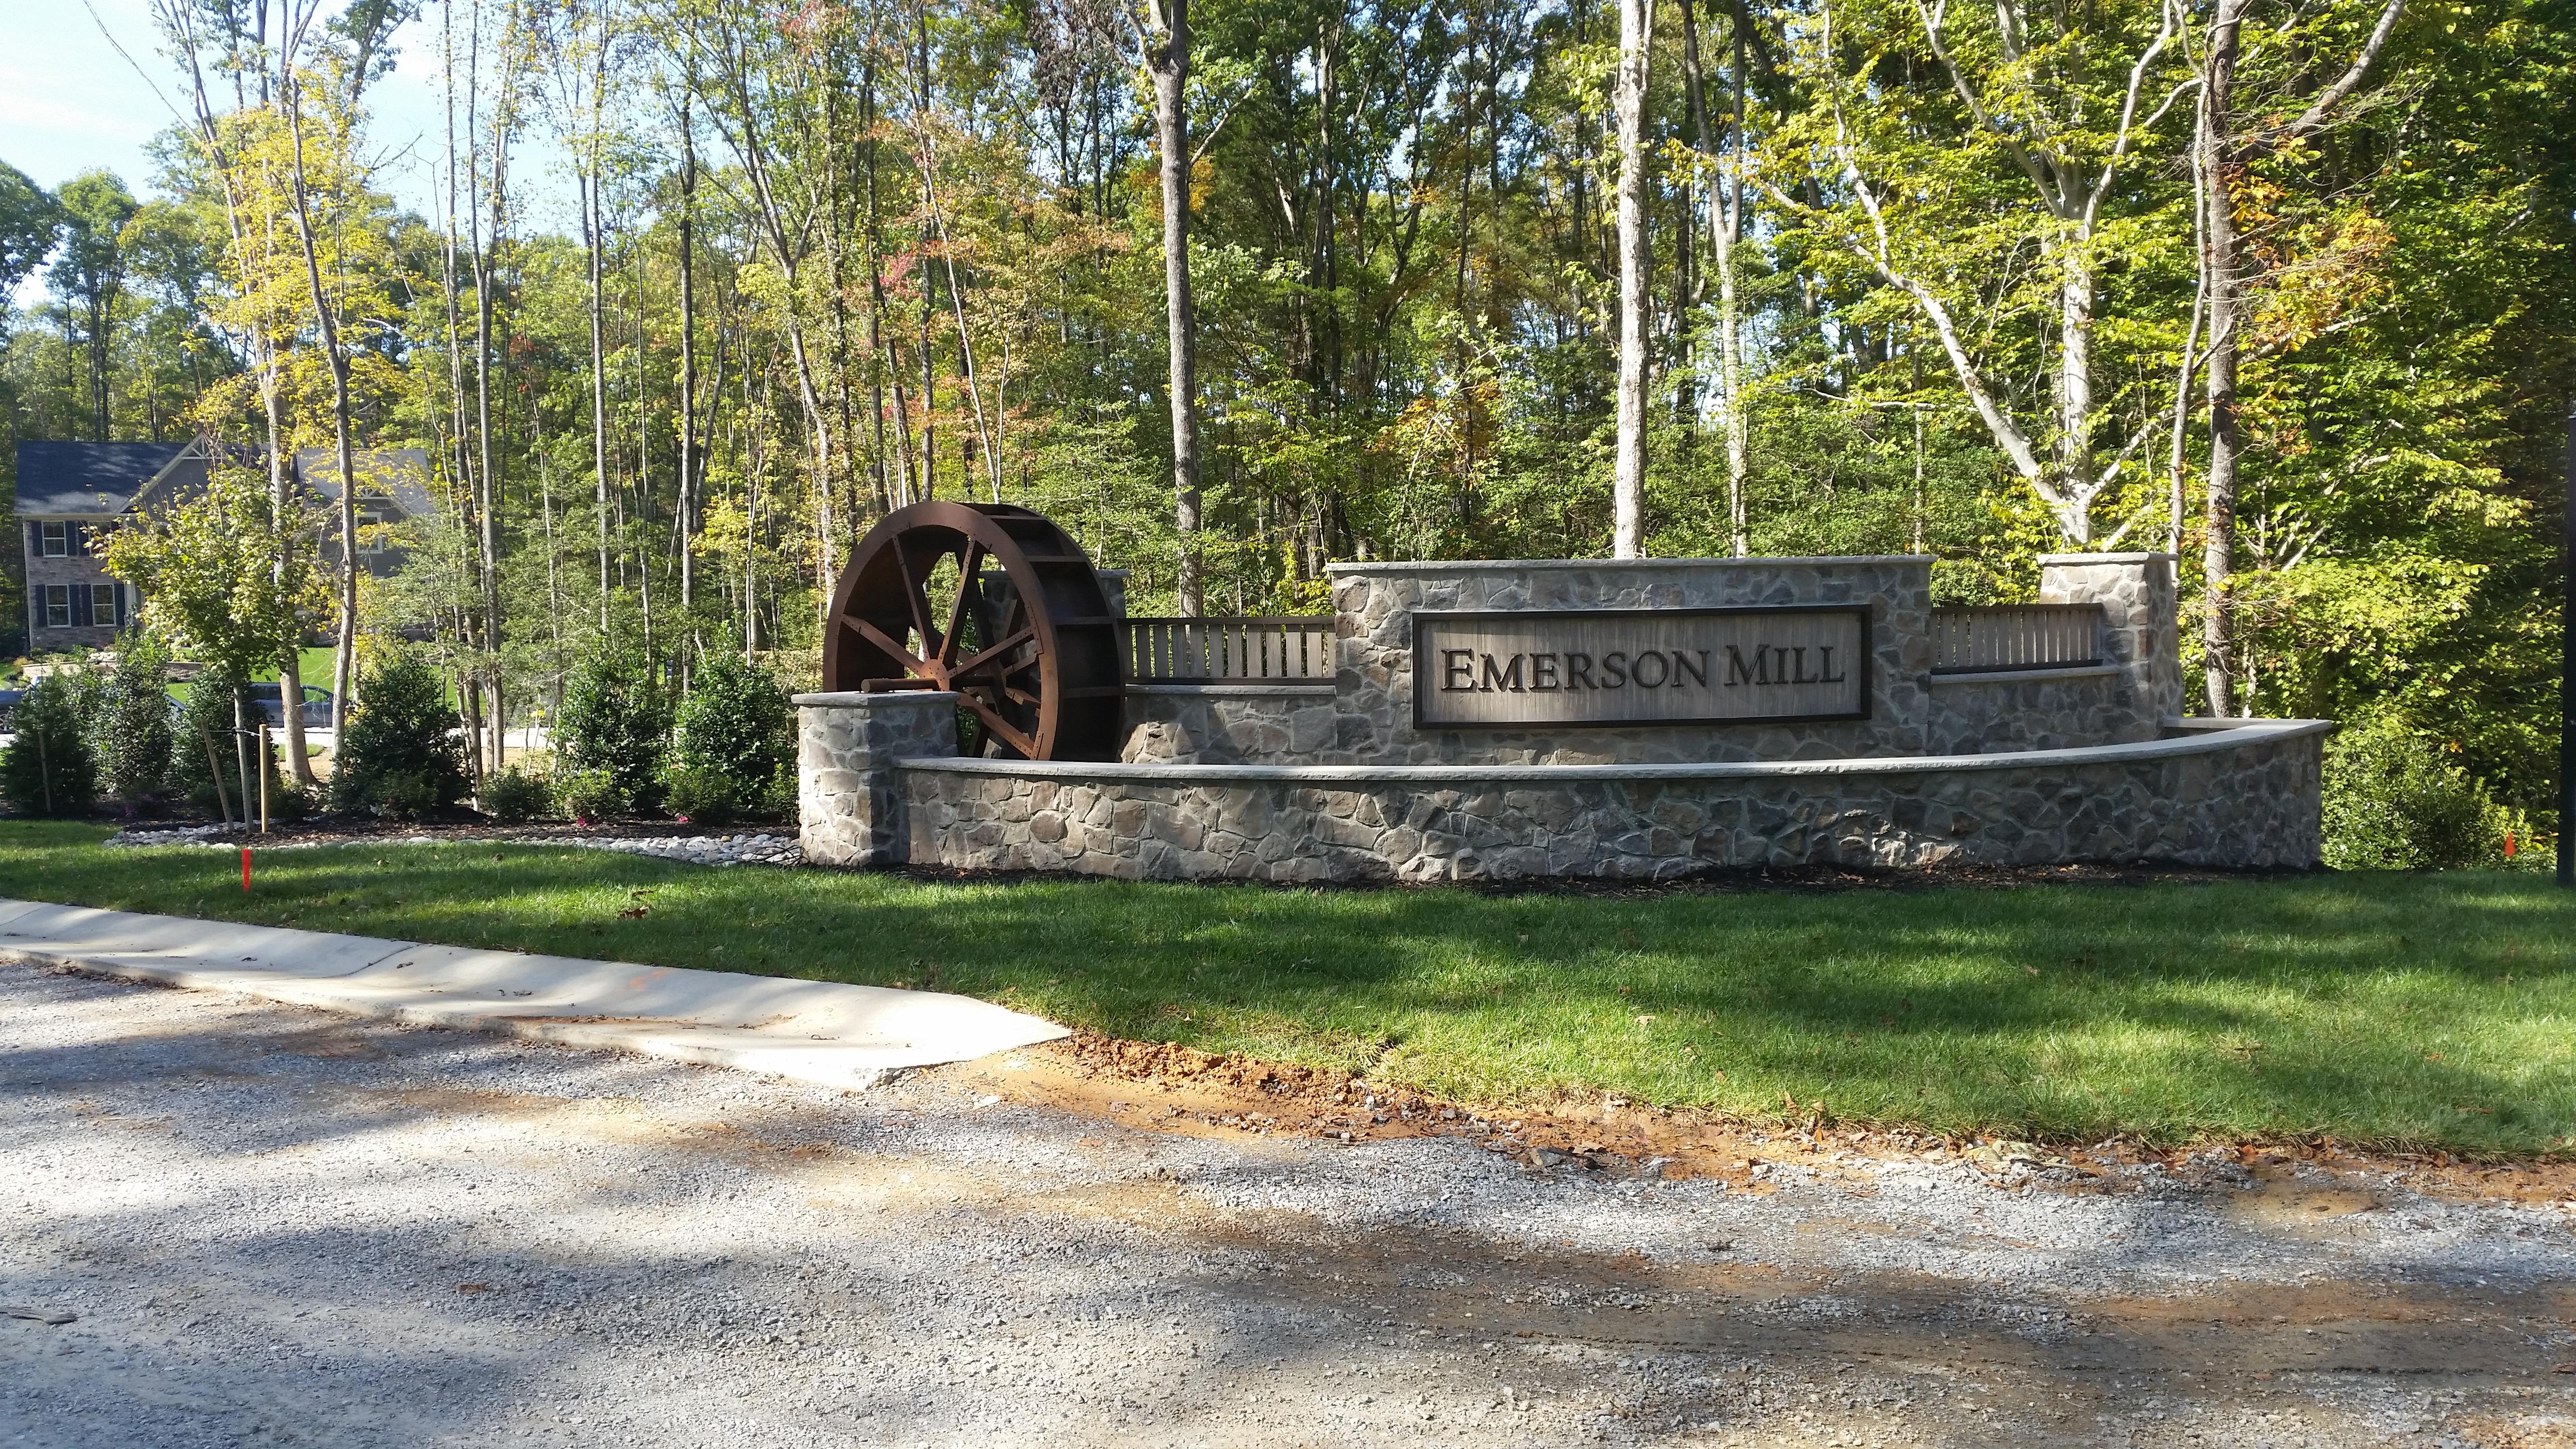 Emerson Mill